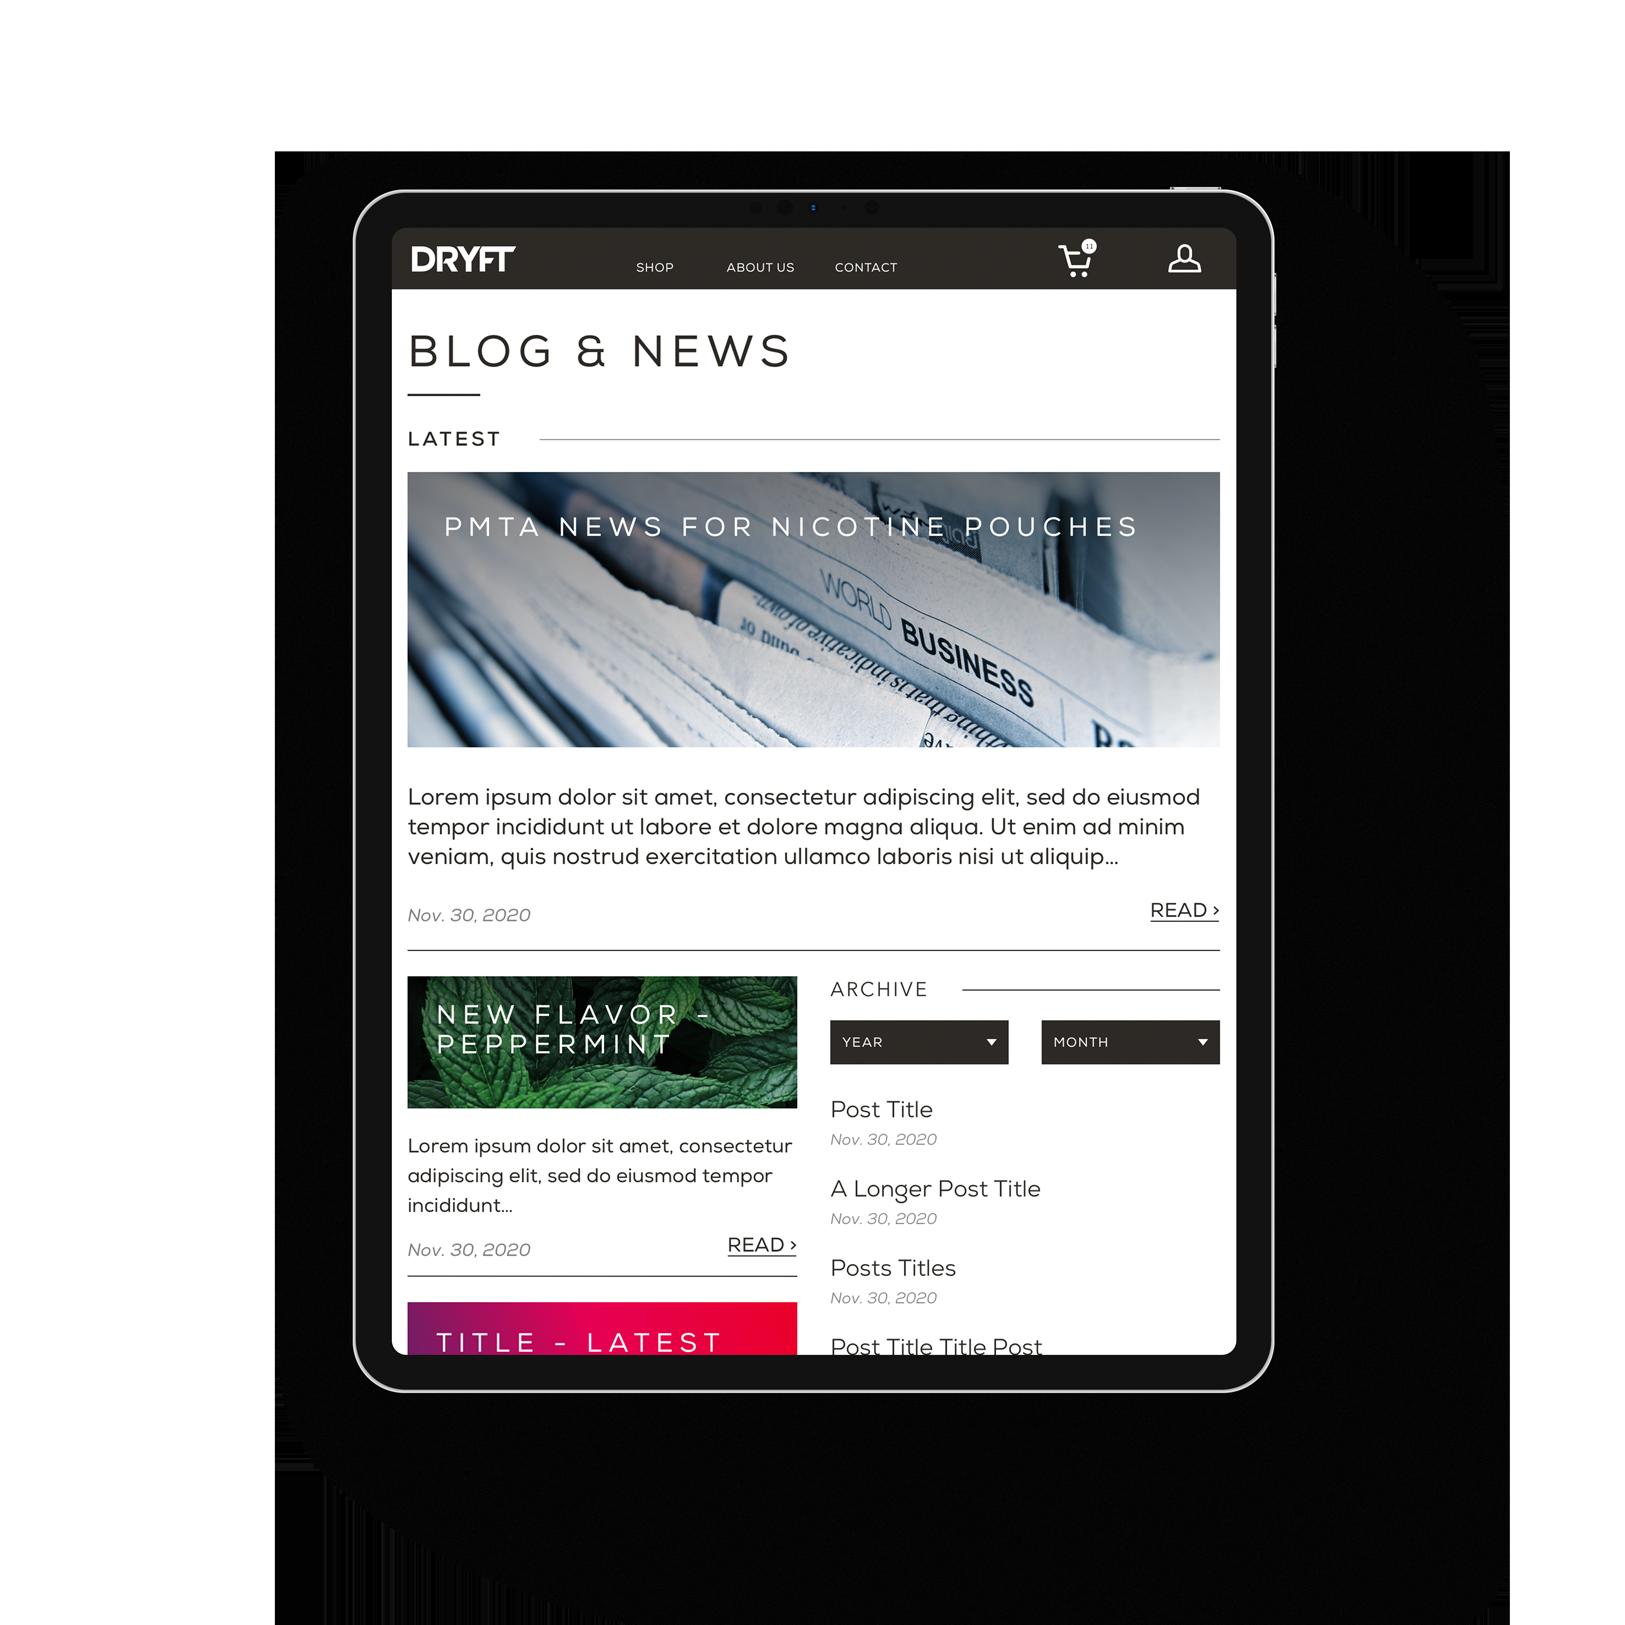 iPad tablet DRYFT blog news page